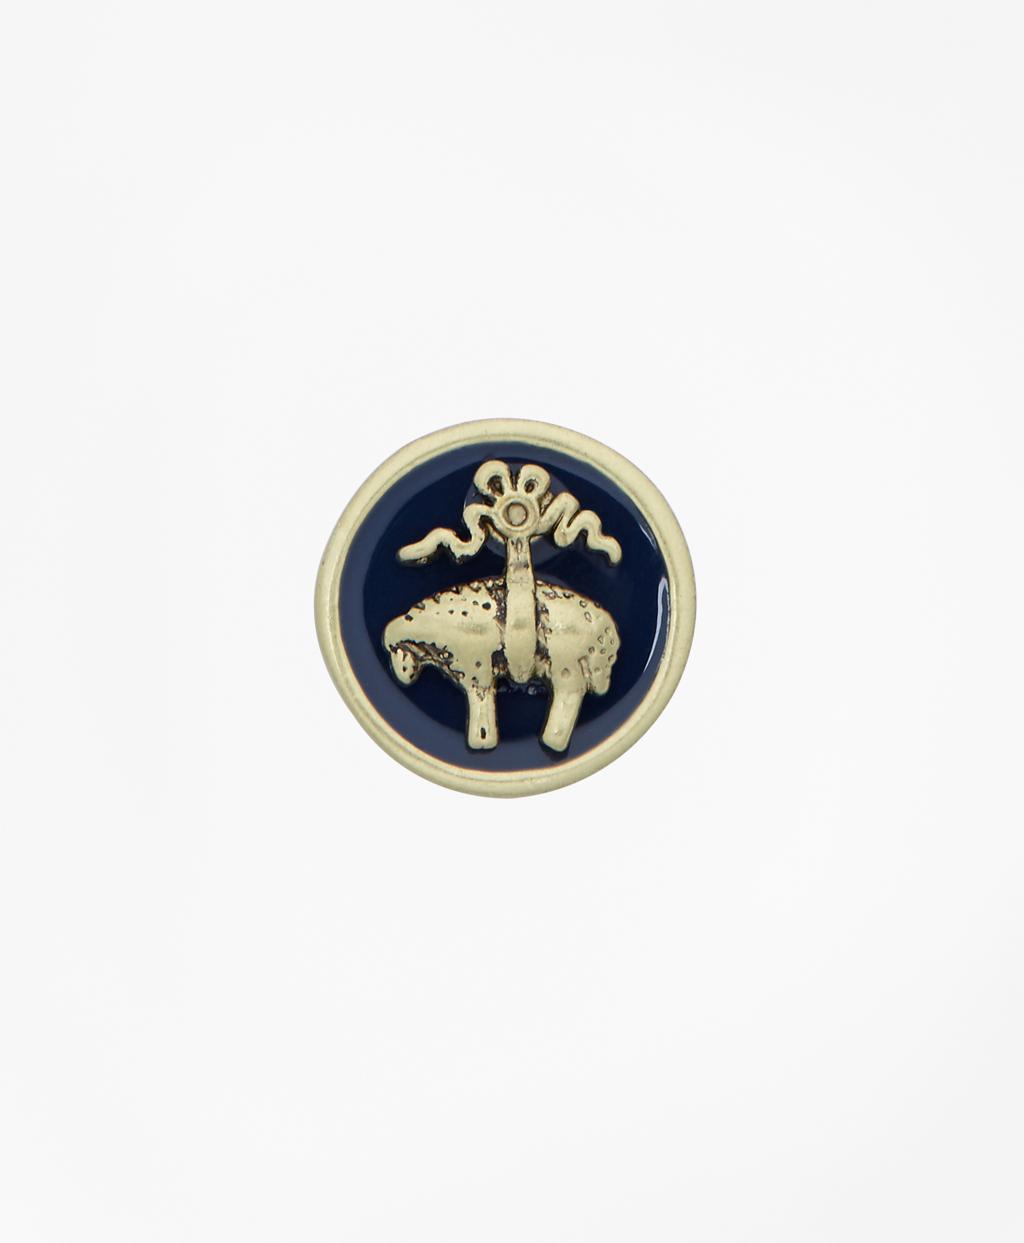 Lyst Brooks Brothers Enamel Lapel Pin In Metallic For Men